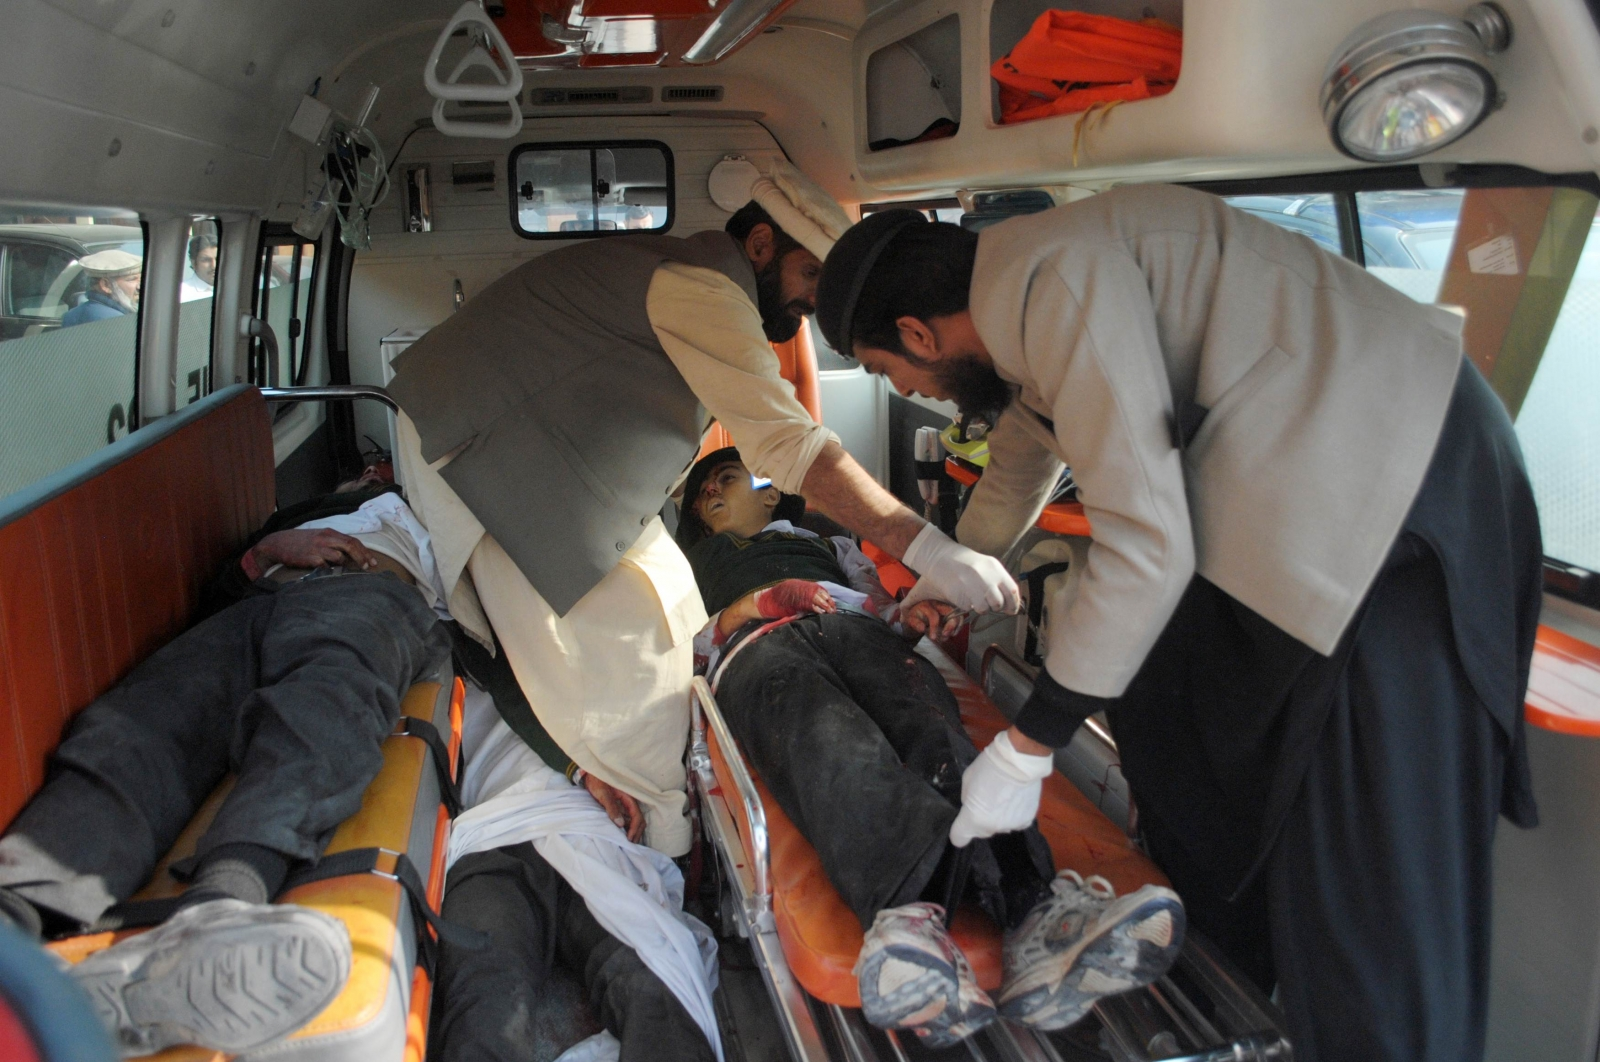 Peshawar school attack: Taliban's 'revenge' for Malala Yousafzai's Nobel Peace Prize